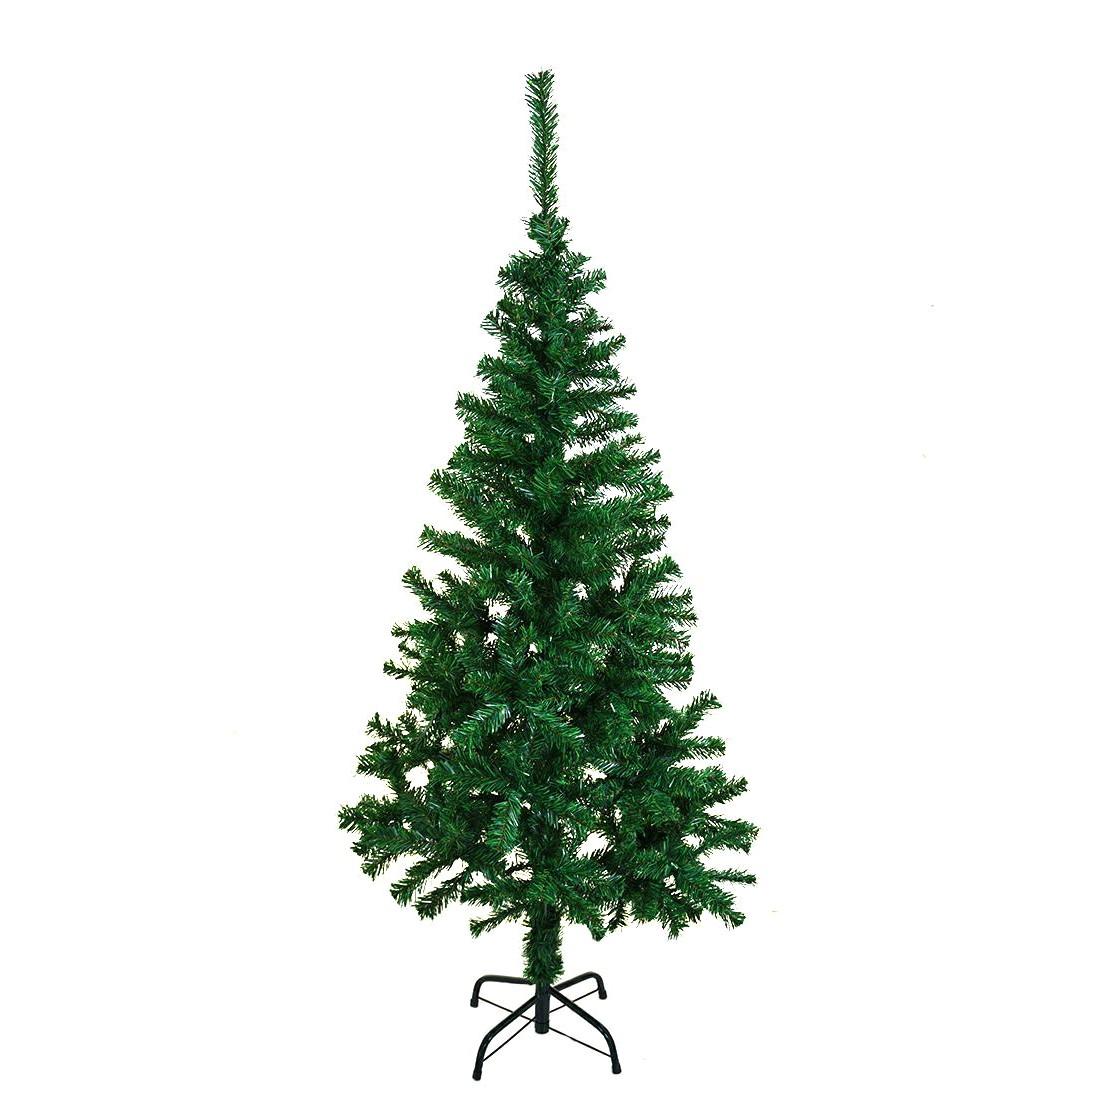 Arvore de Natal 150cm 350 Galhos Verde 47489 - GPresentes